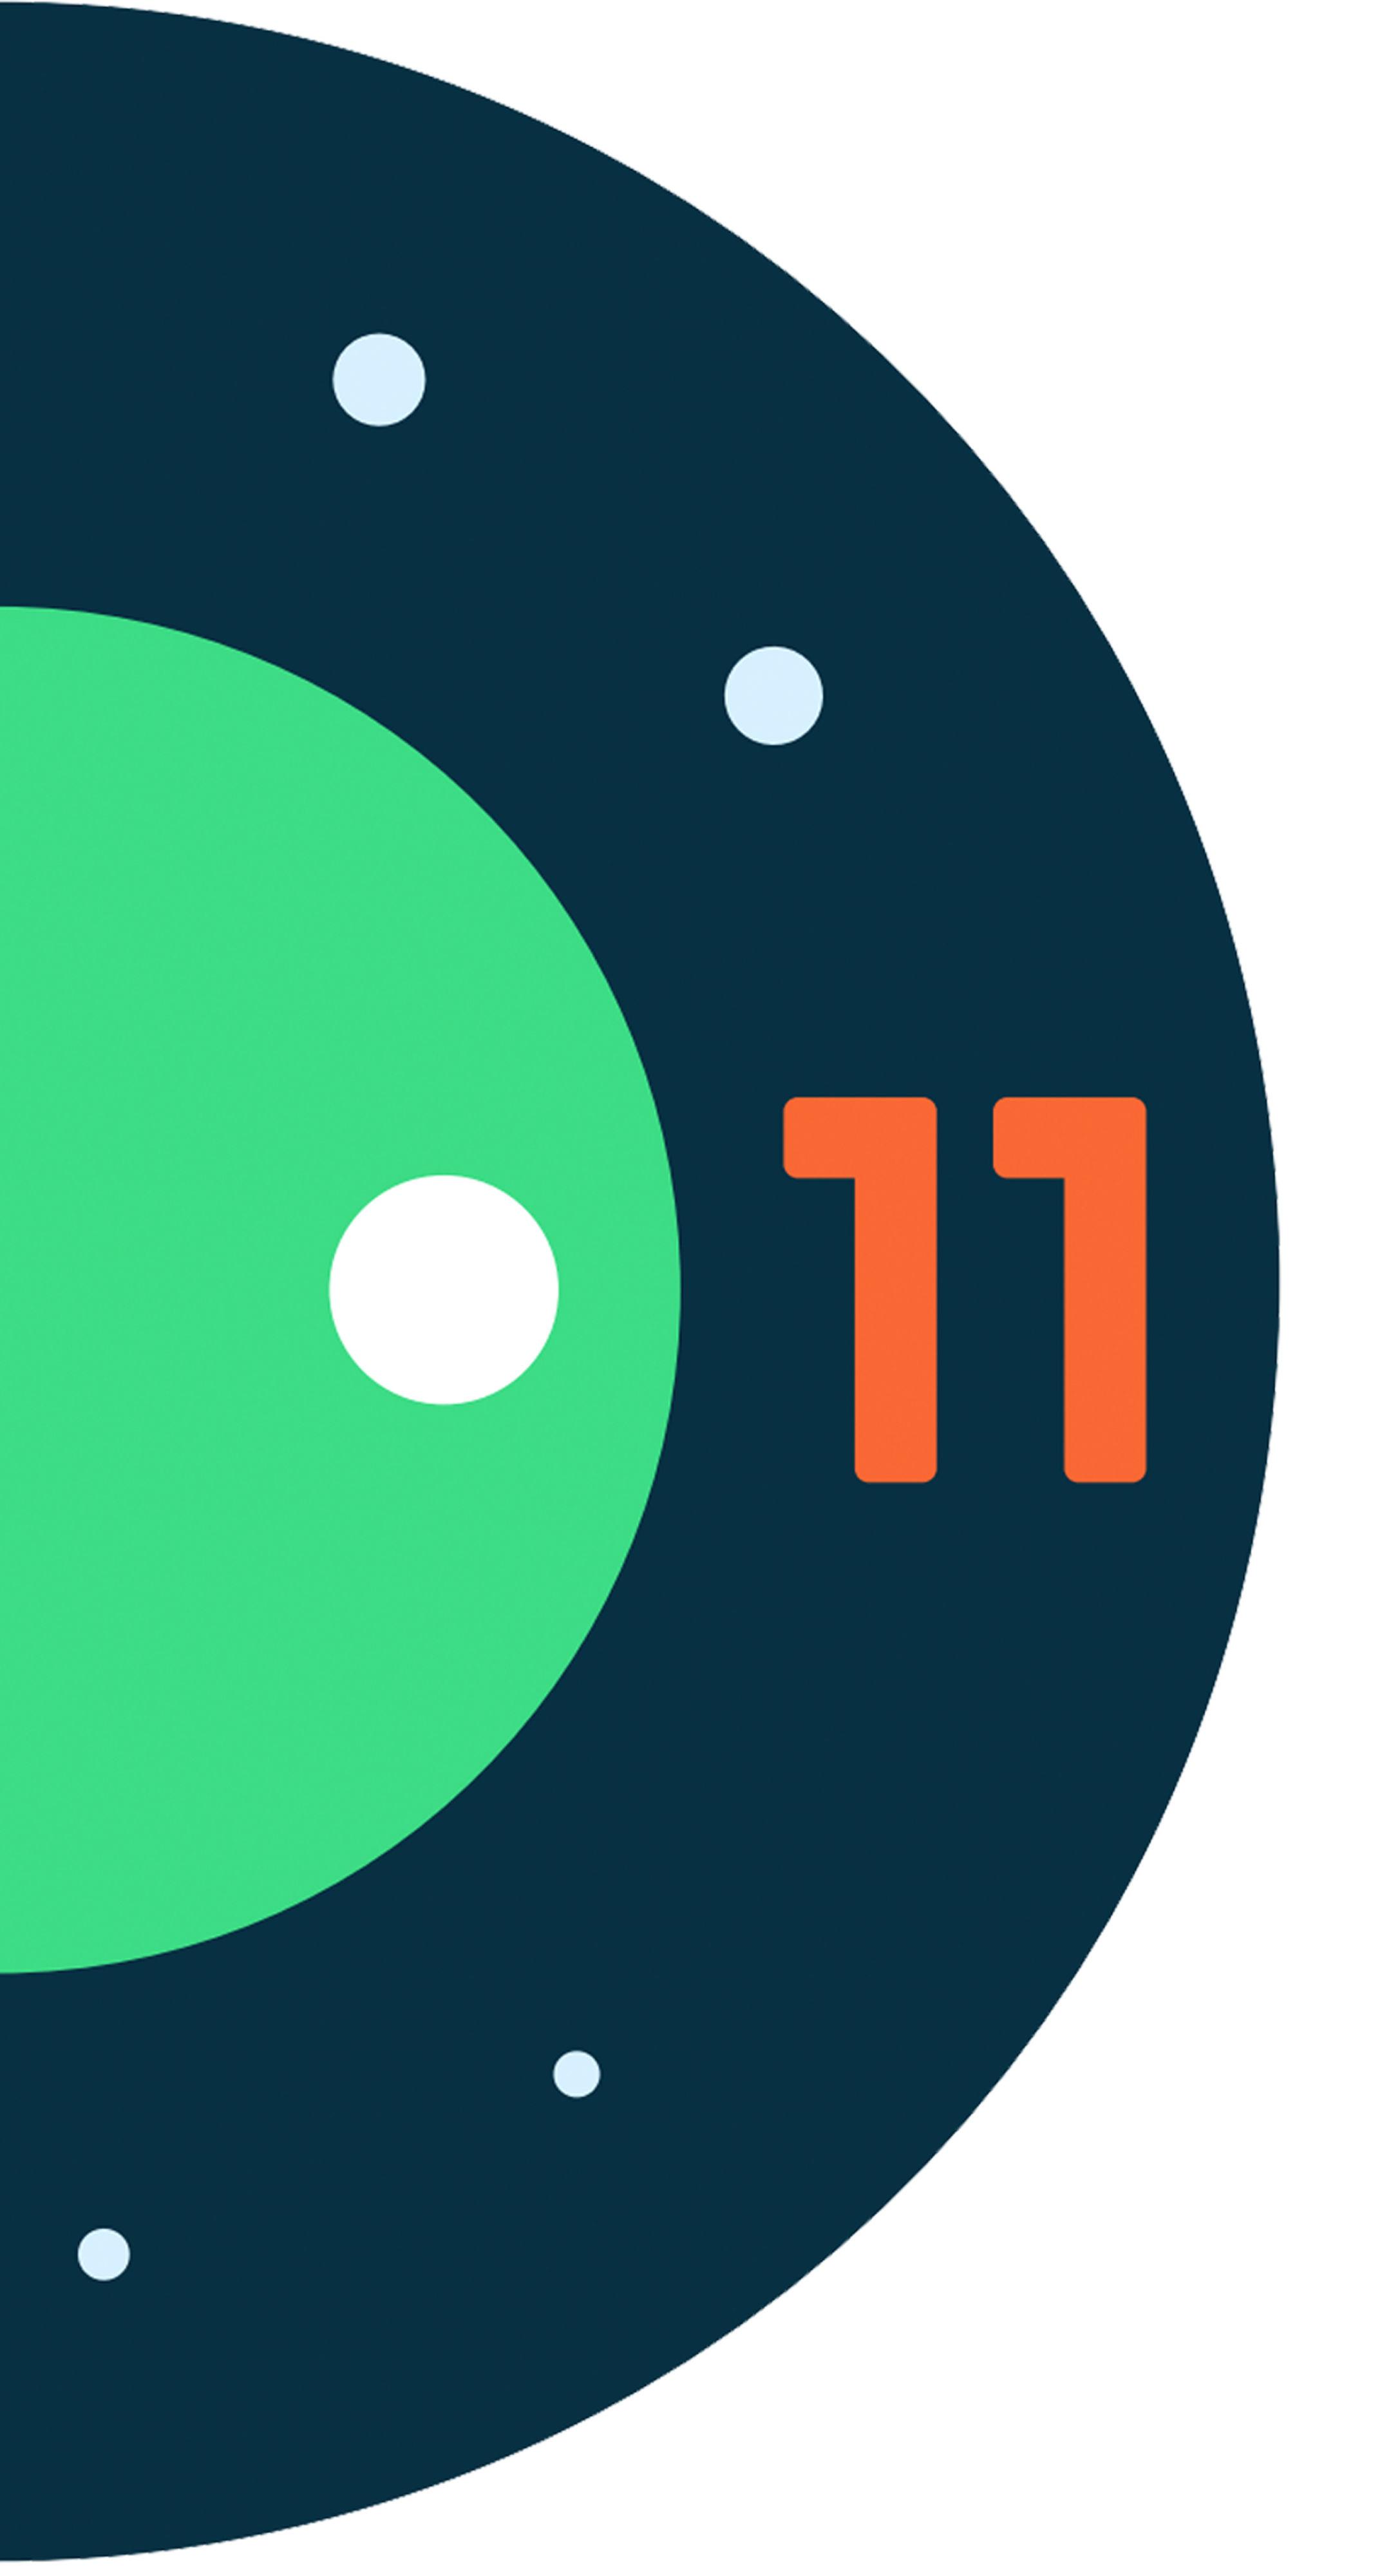 android-11-logo-large-white